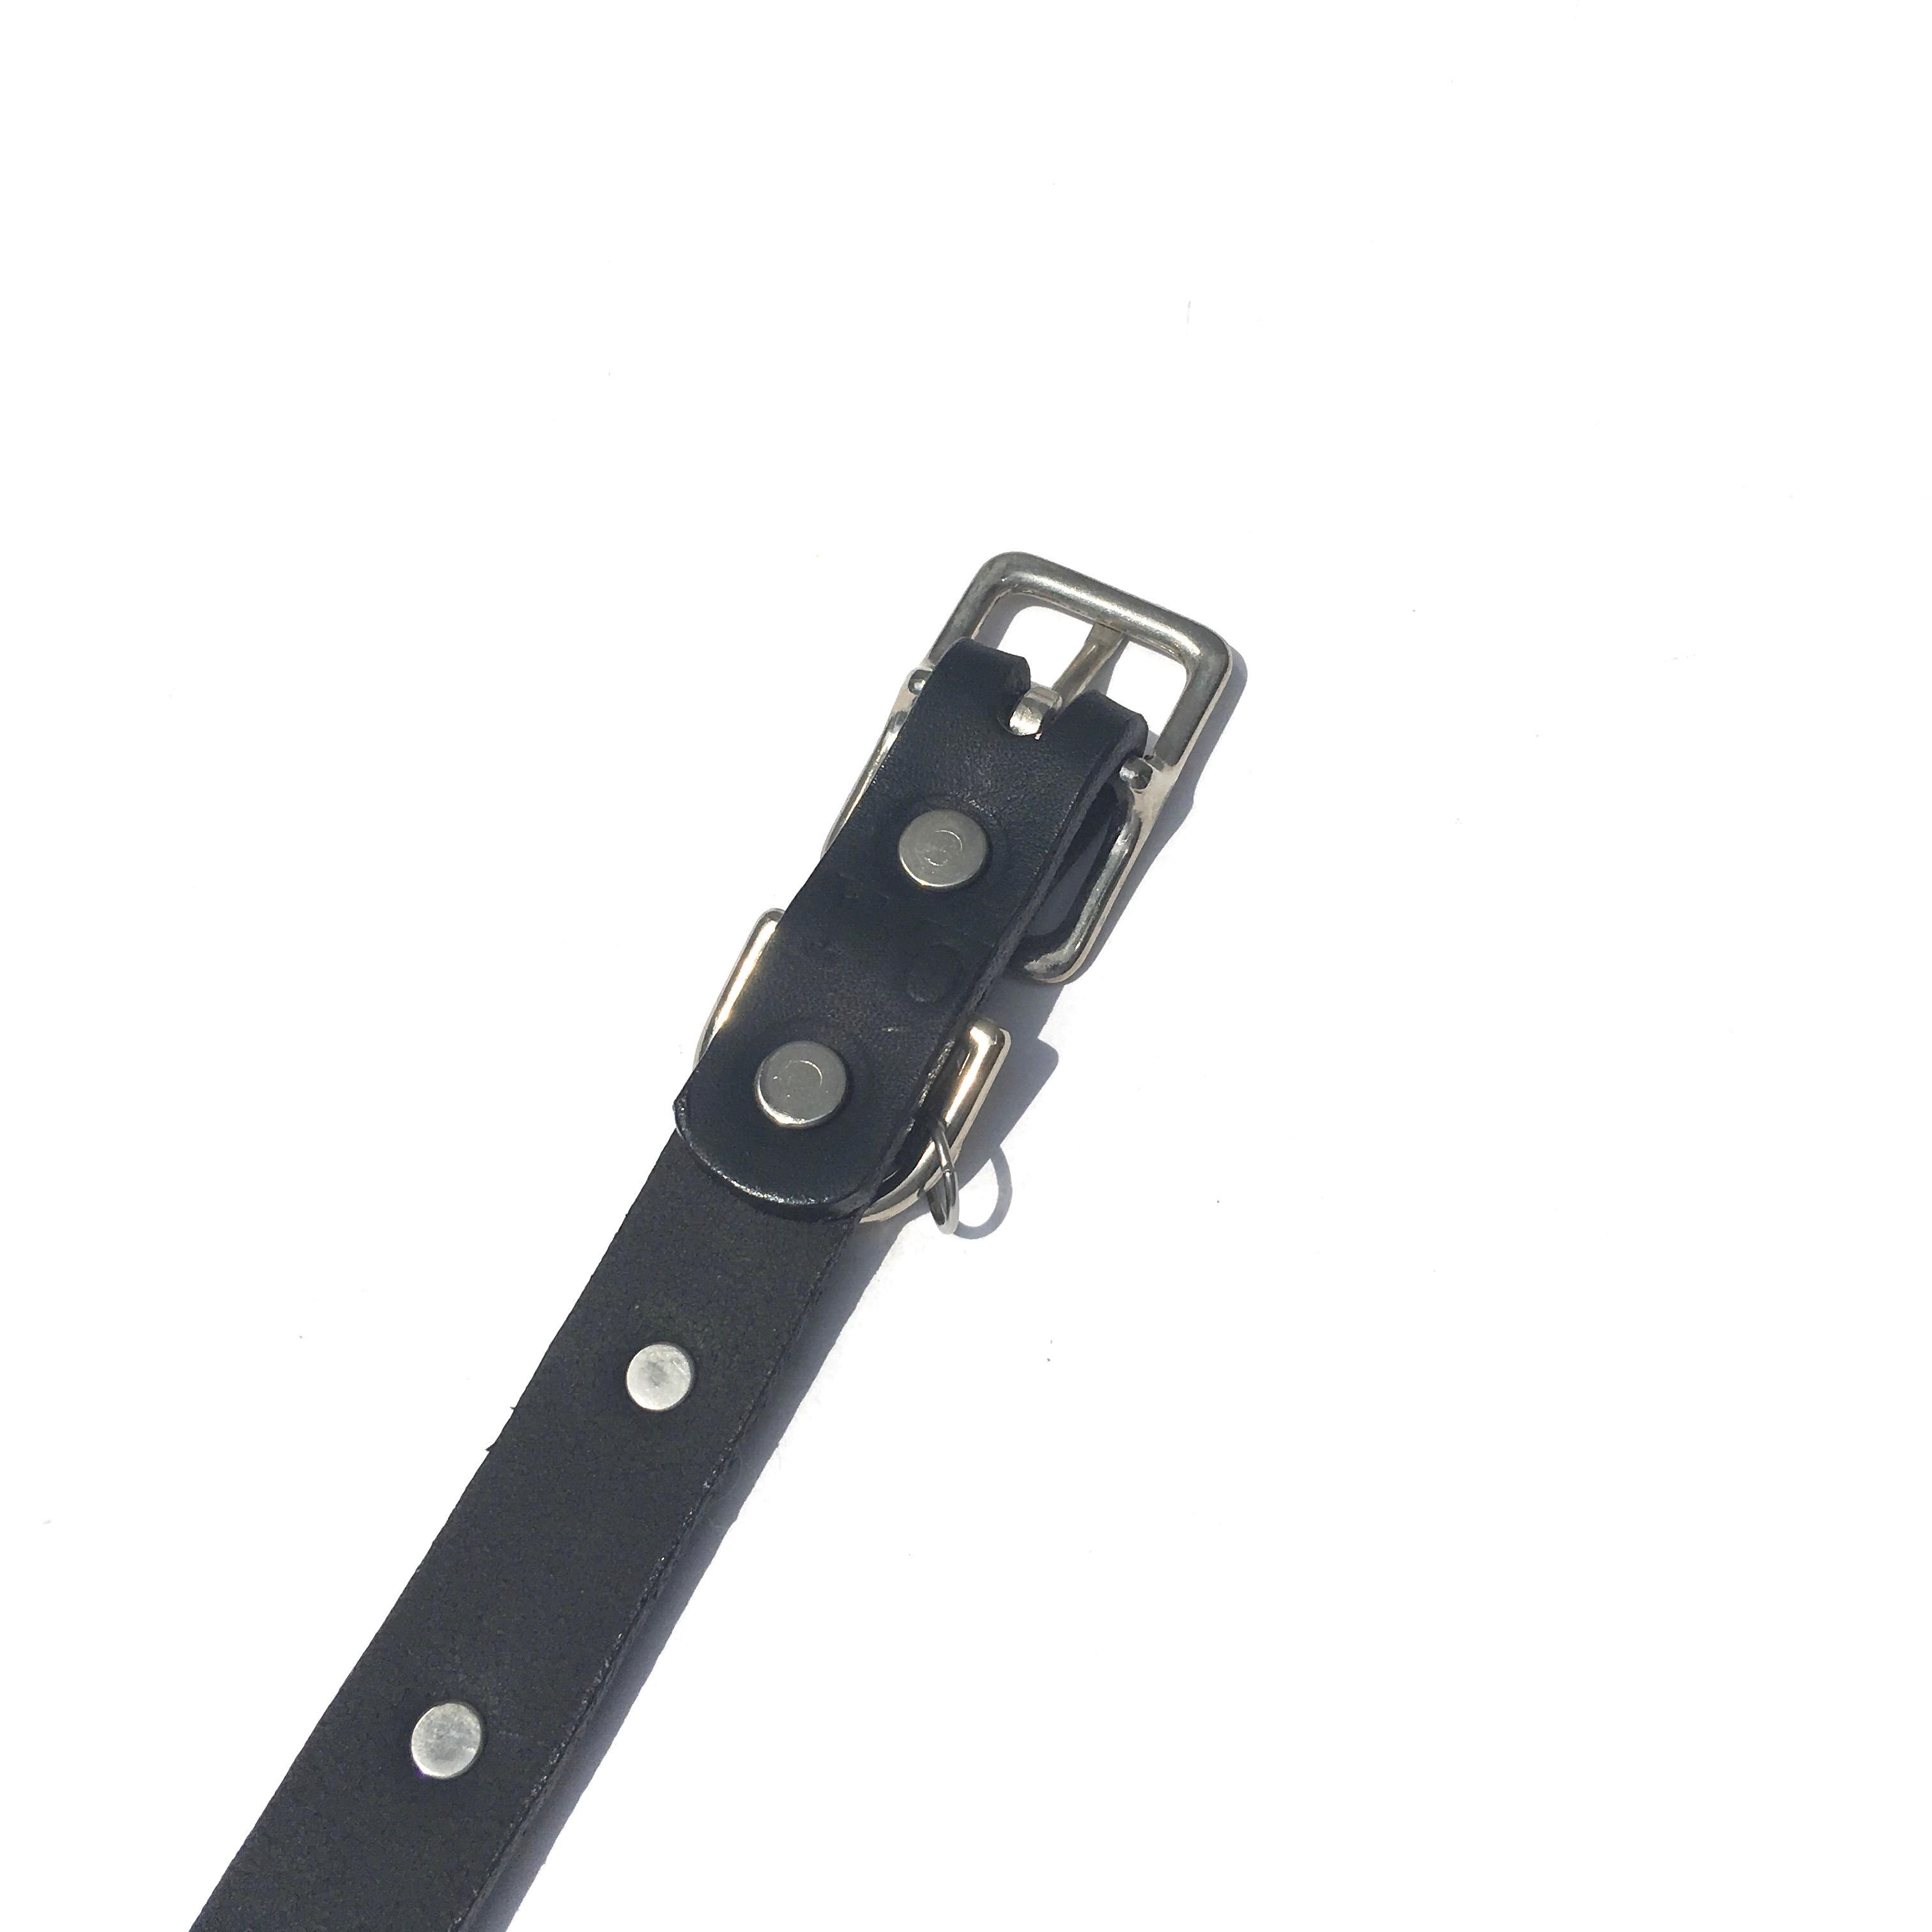 Dog La Star COLLAR ドグラ スター カラー 3/4インチ(2cm幅) 別注10インチ_d0217958_1213227.jpg